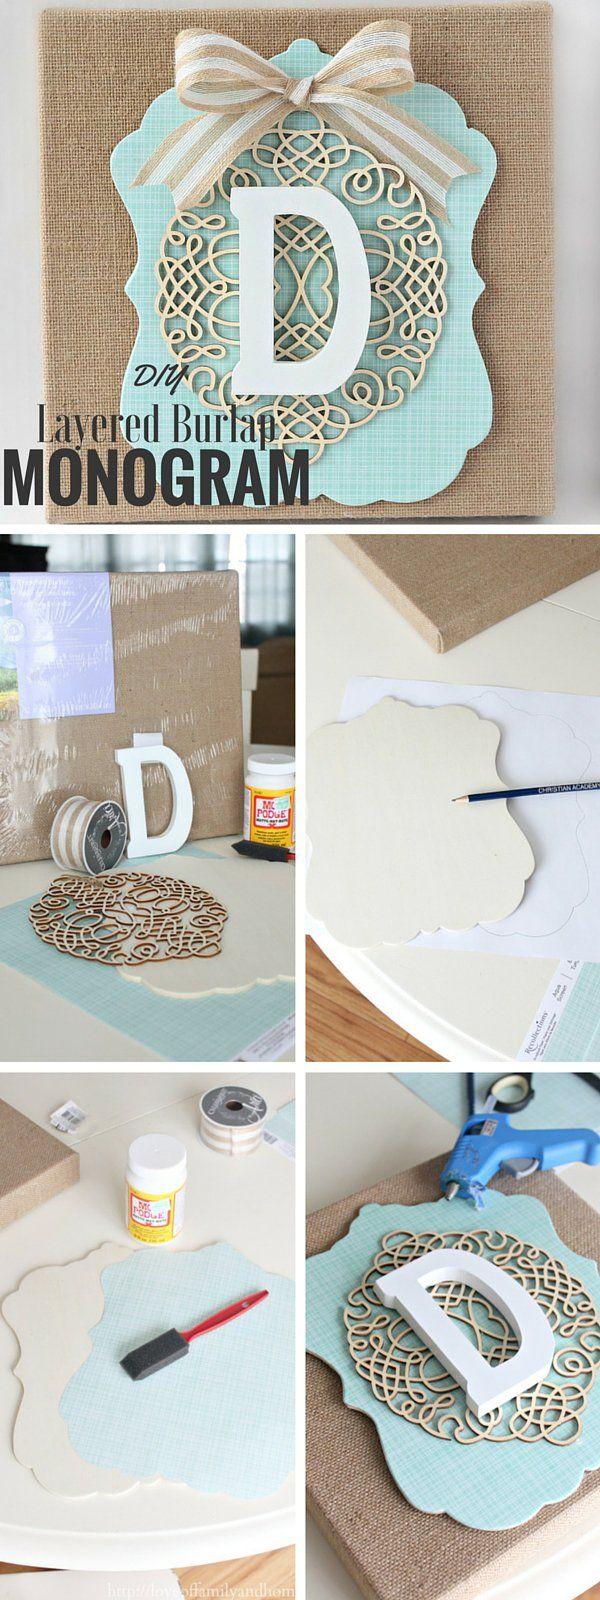 Check out the tutorial: #DIY Layered Burlap Monogram @istandarddesign